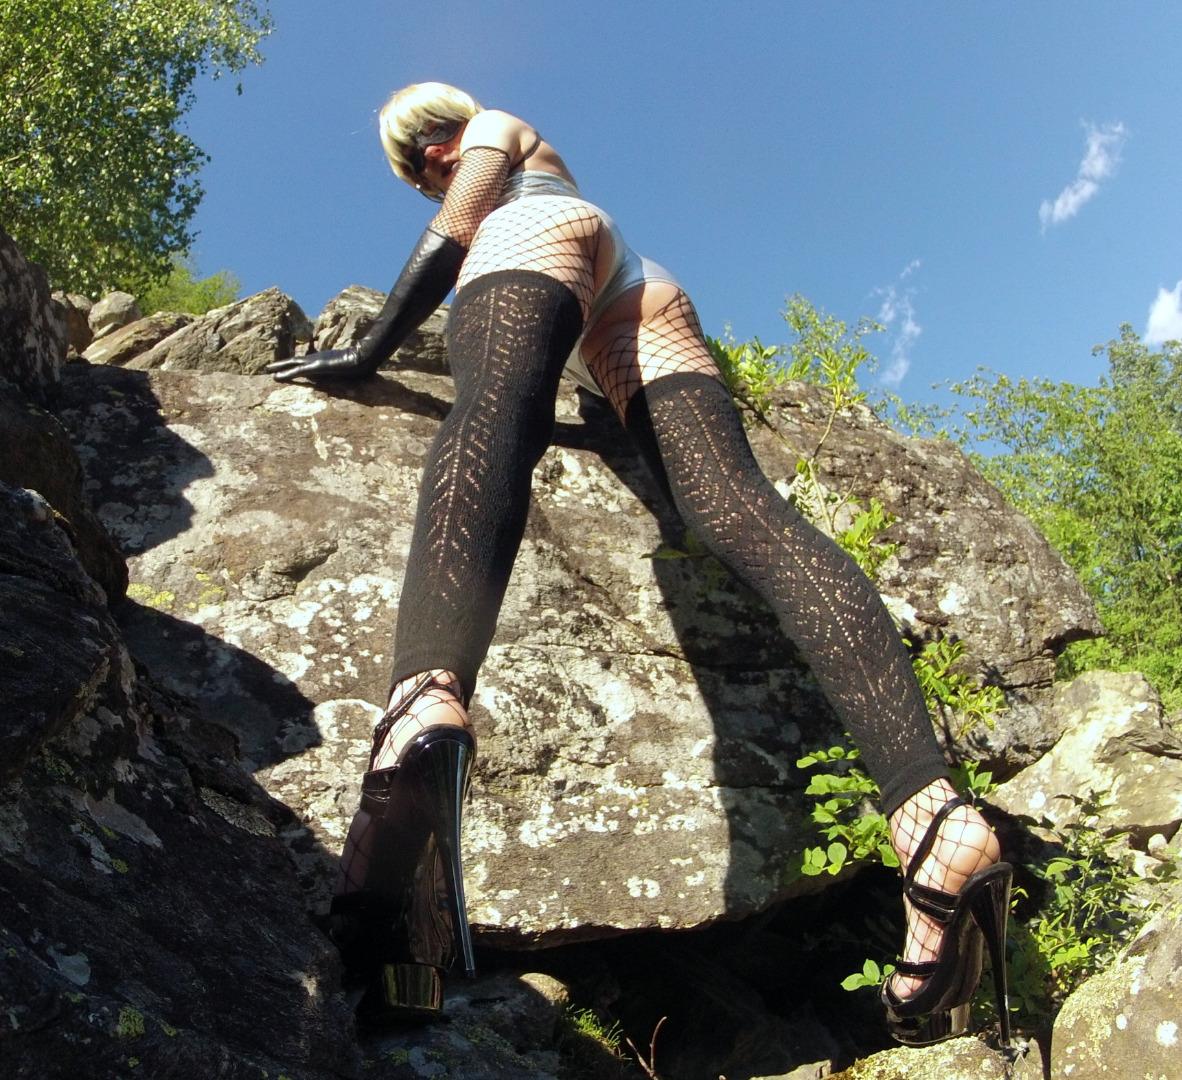 convulsion orgasm free tubes look excite #crossdresser  #sissy  #cd  #transgirl  #trap  #trannies  #cutetrap  #femboy  #sissyboy  #trans  #tv  #transvestite  #dwt  #sissyboyqueen  #transsexual